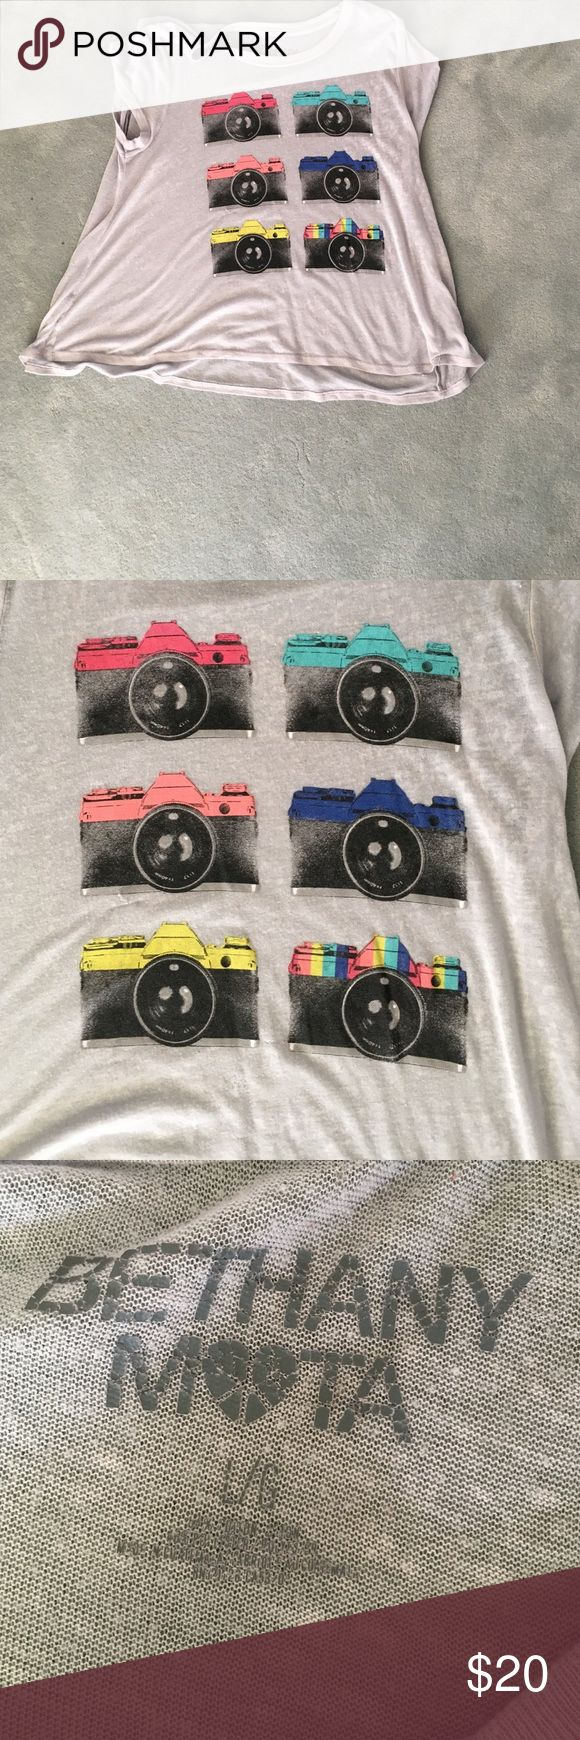 Bethany Mots camera tee shirt sheer gray tee with camera designs on it Aeropostale Tops Tees - Short Sleeve